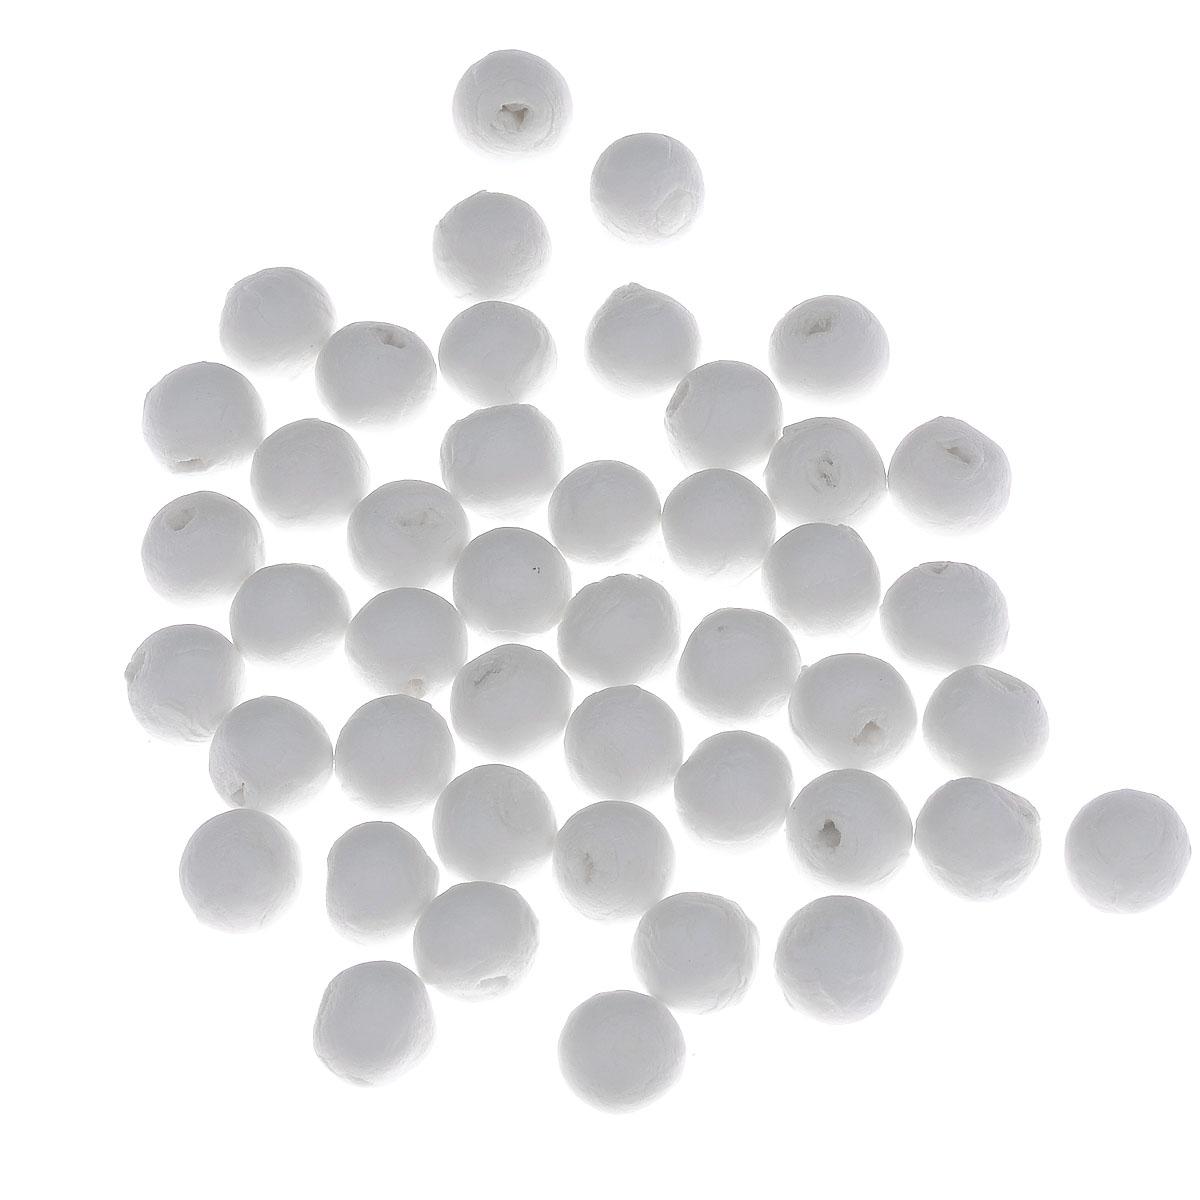 Шарики хлопковые Hobby Time, цвет: белый, диаметр 12 мм, 45 шт